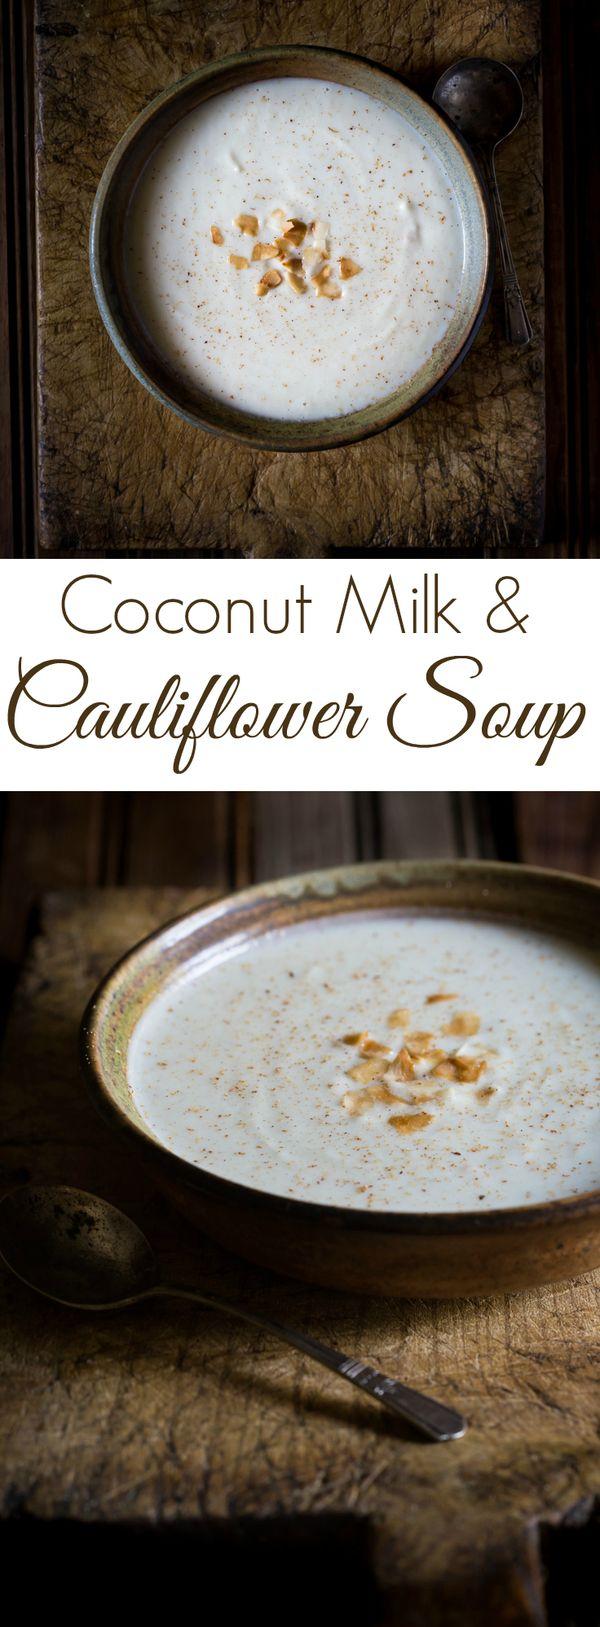 Cauliflower and Coconut Milk Soup